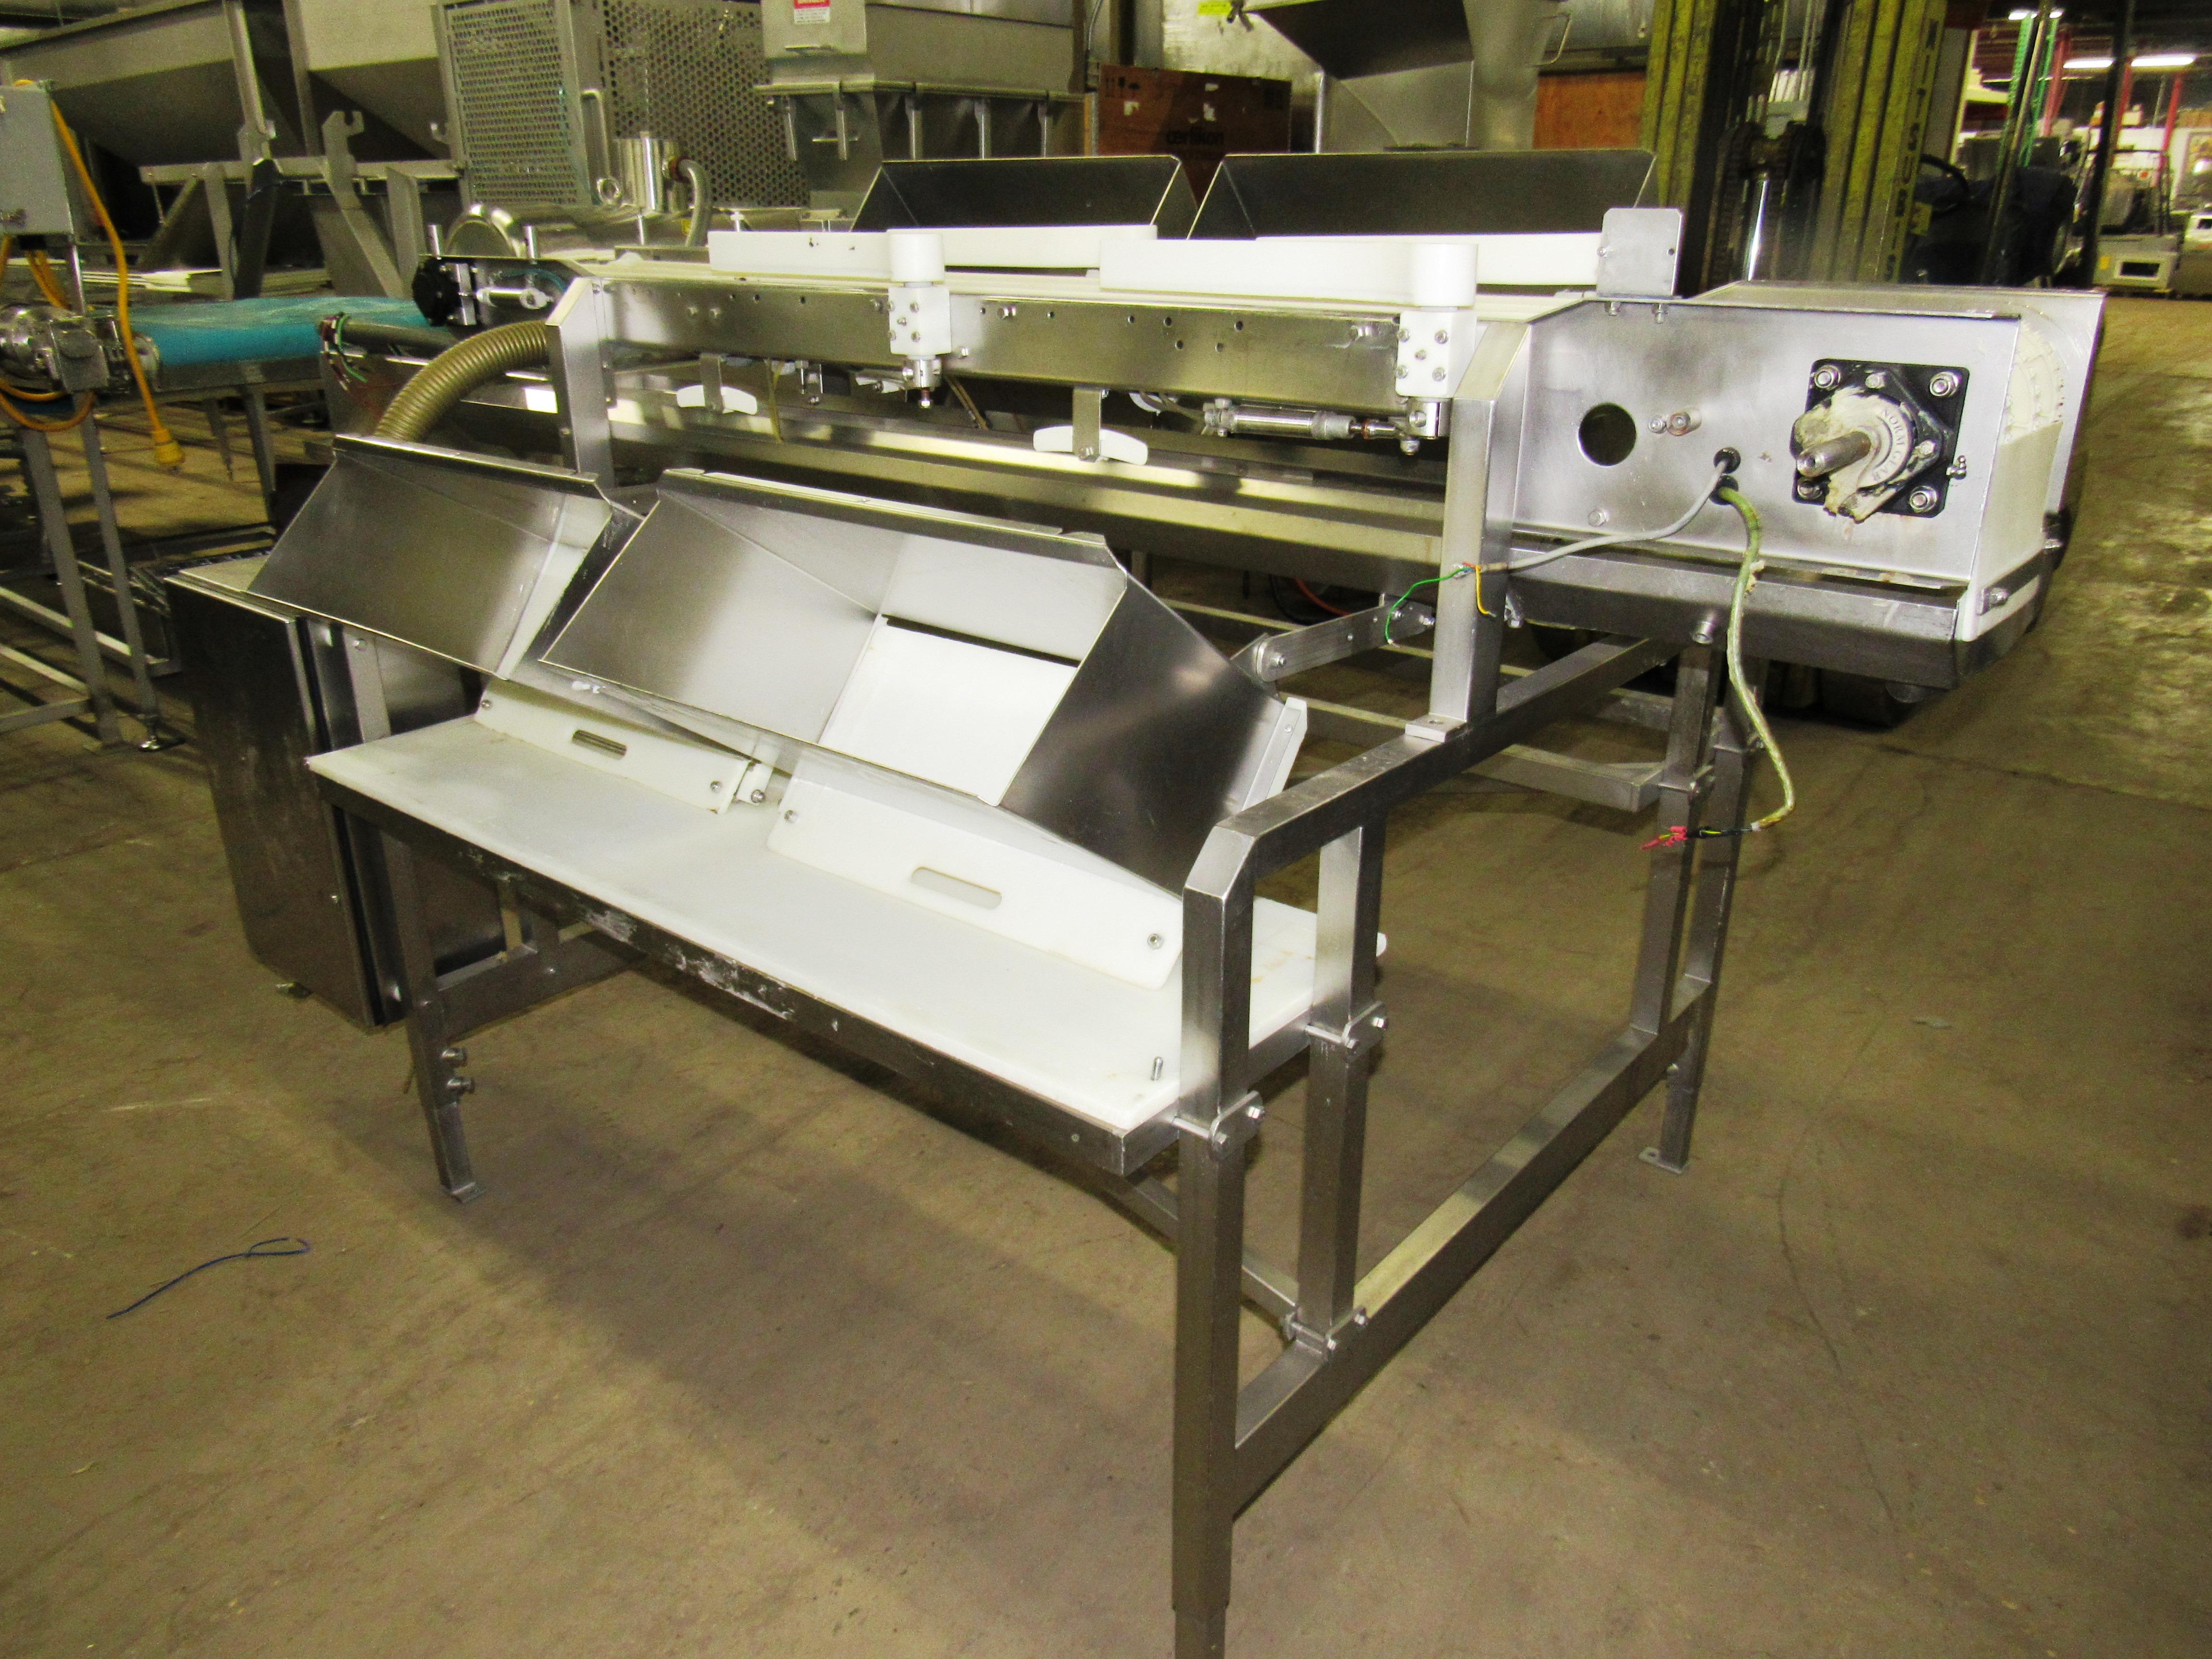 "Lot 31 - Stainless Steel Grading Conveyor (no belt), 12"" W X 88"" L, (2) stations each side"